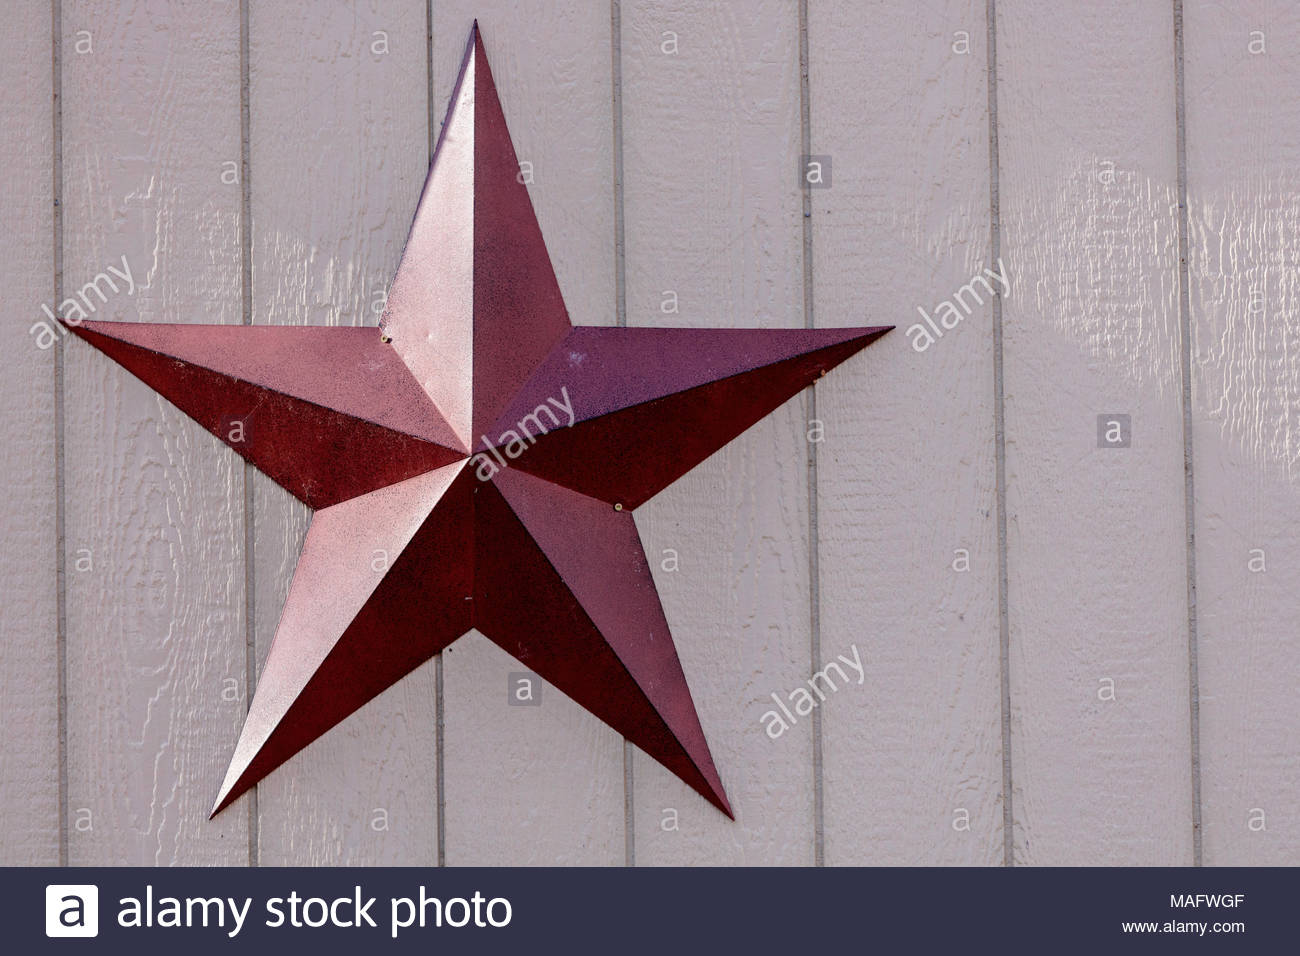 Barnstar a 5 pointed star hist...